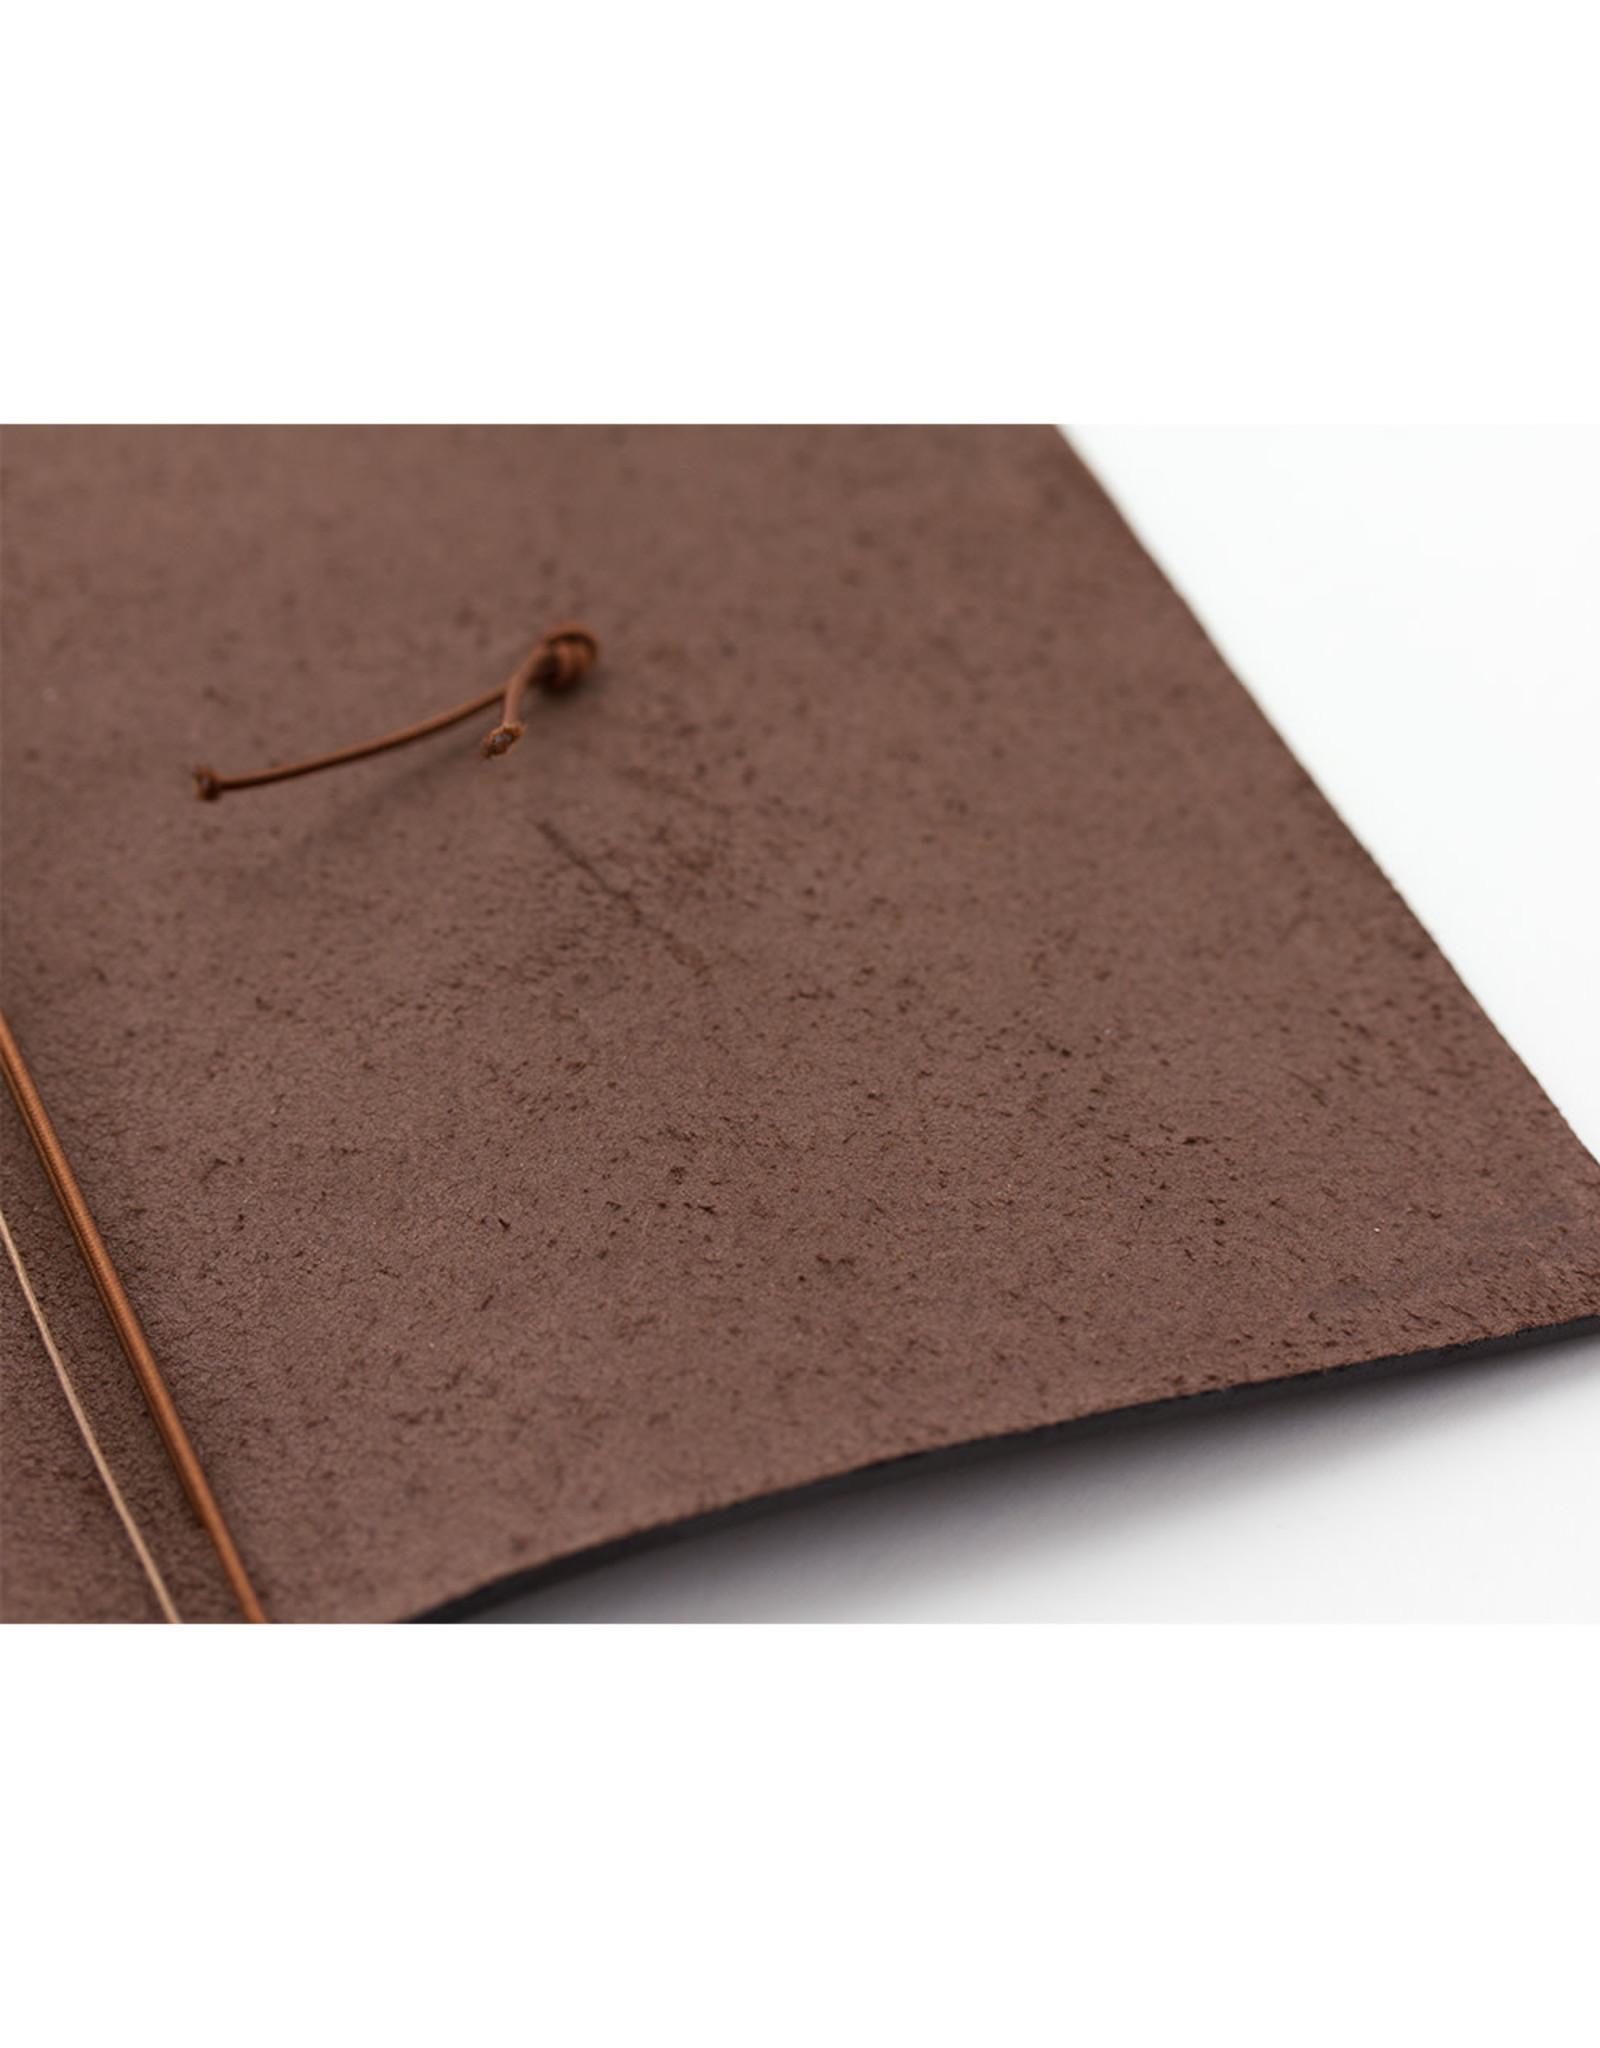 Traveler's Company TRAVELER'S NOTEBOOK REGULAR SIZE BROWN